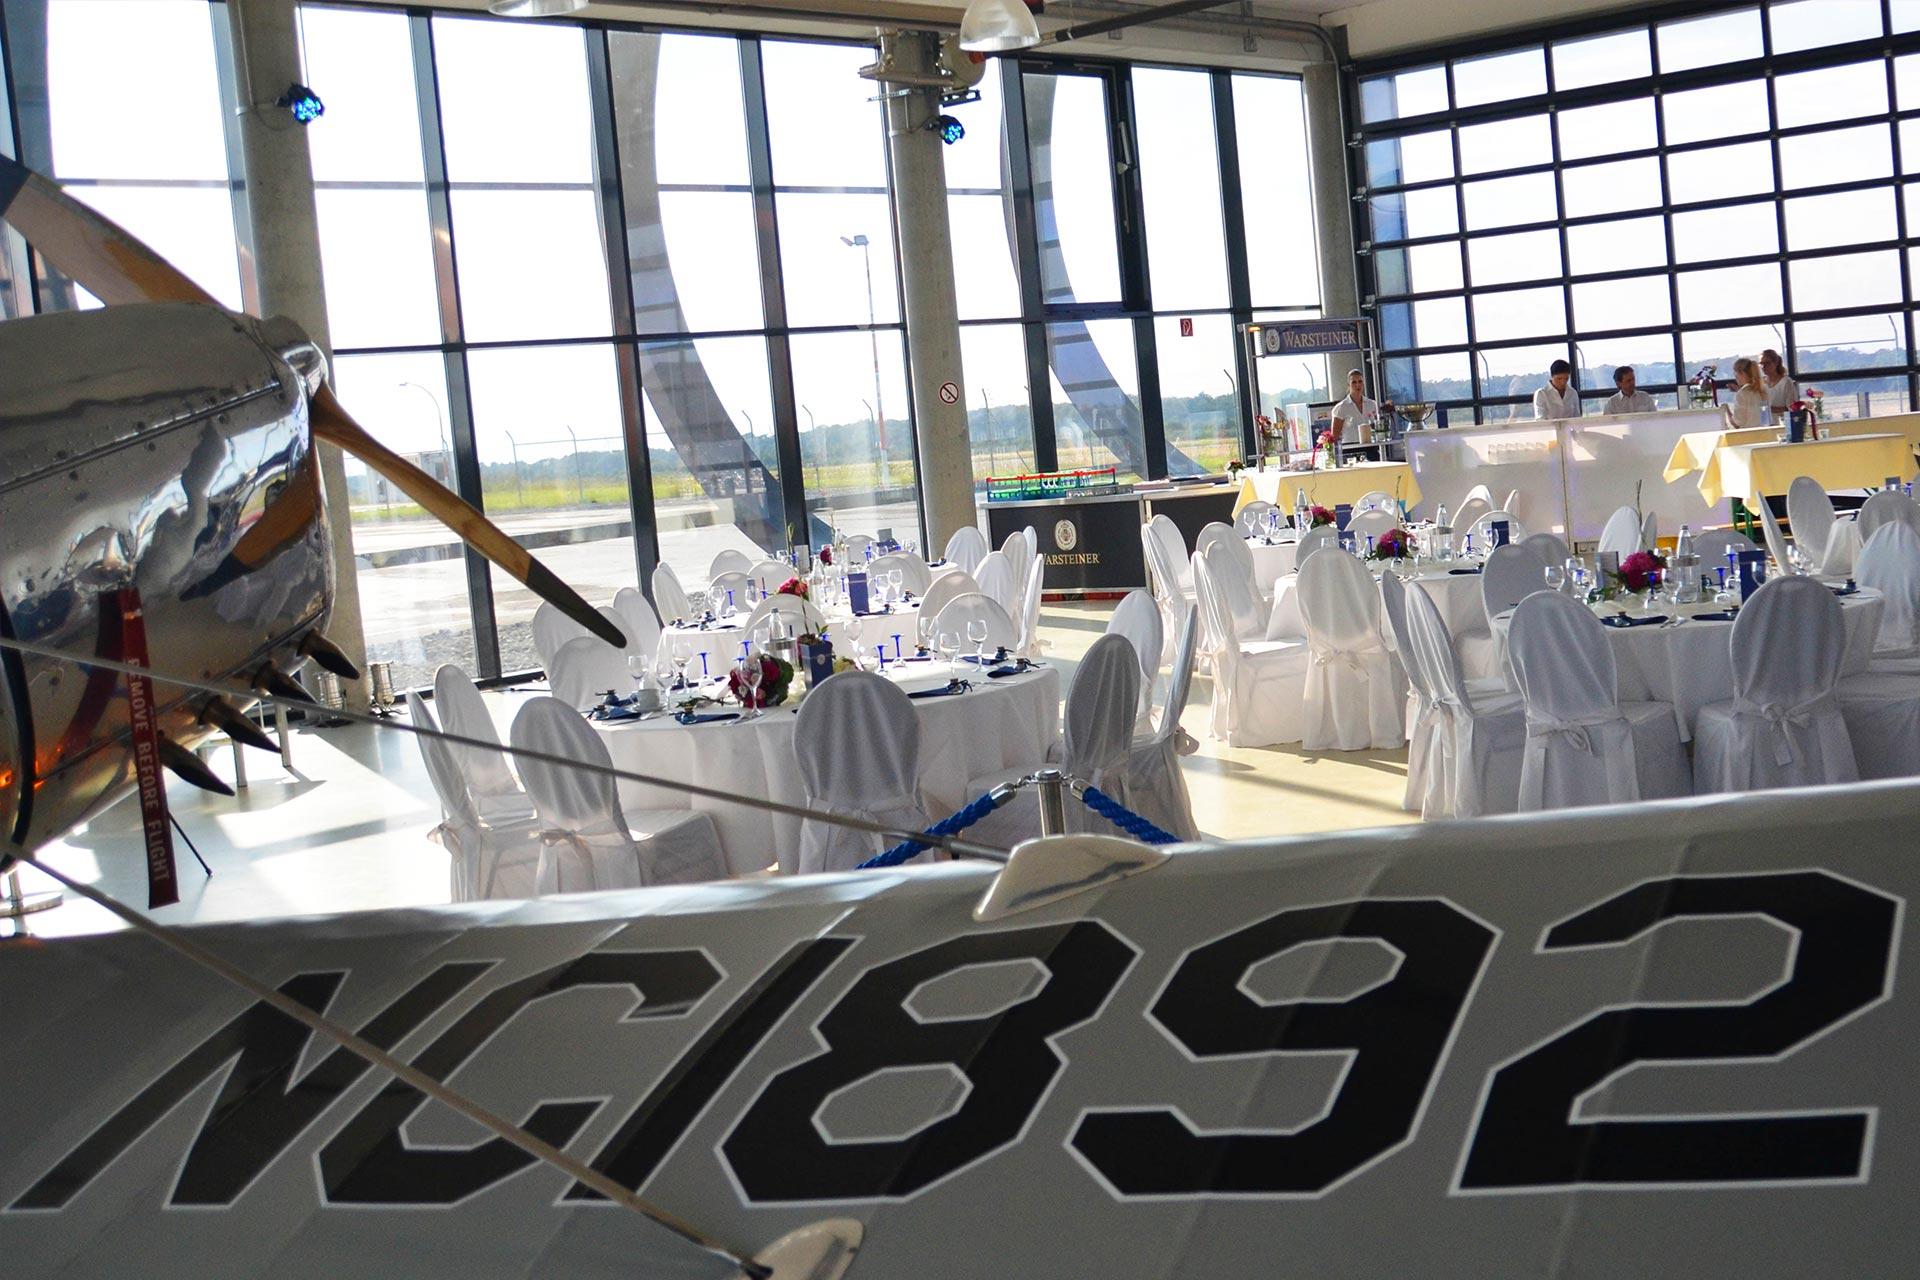 Quax-Hangar-Paderborn-Flughafen-Event-Slider01